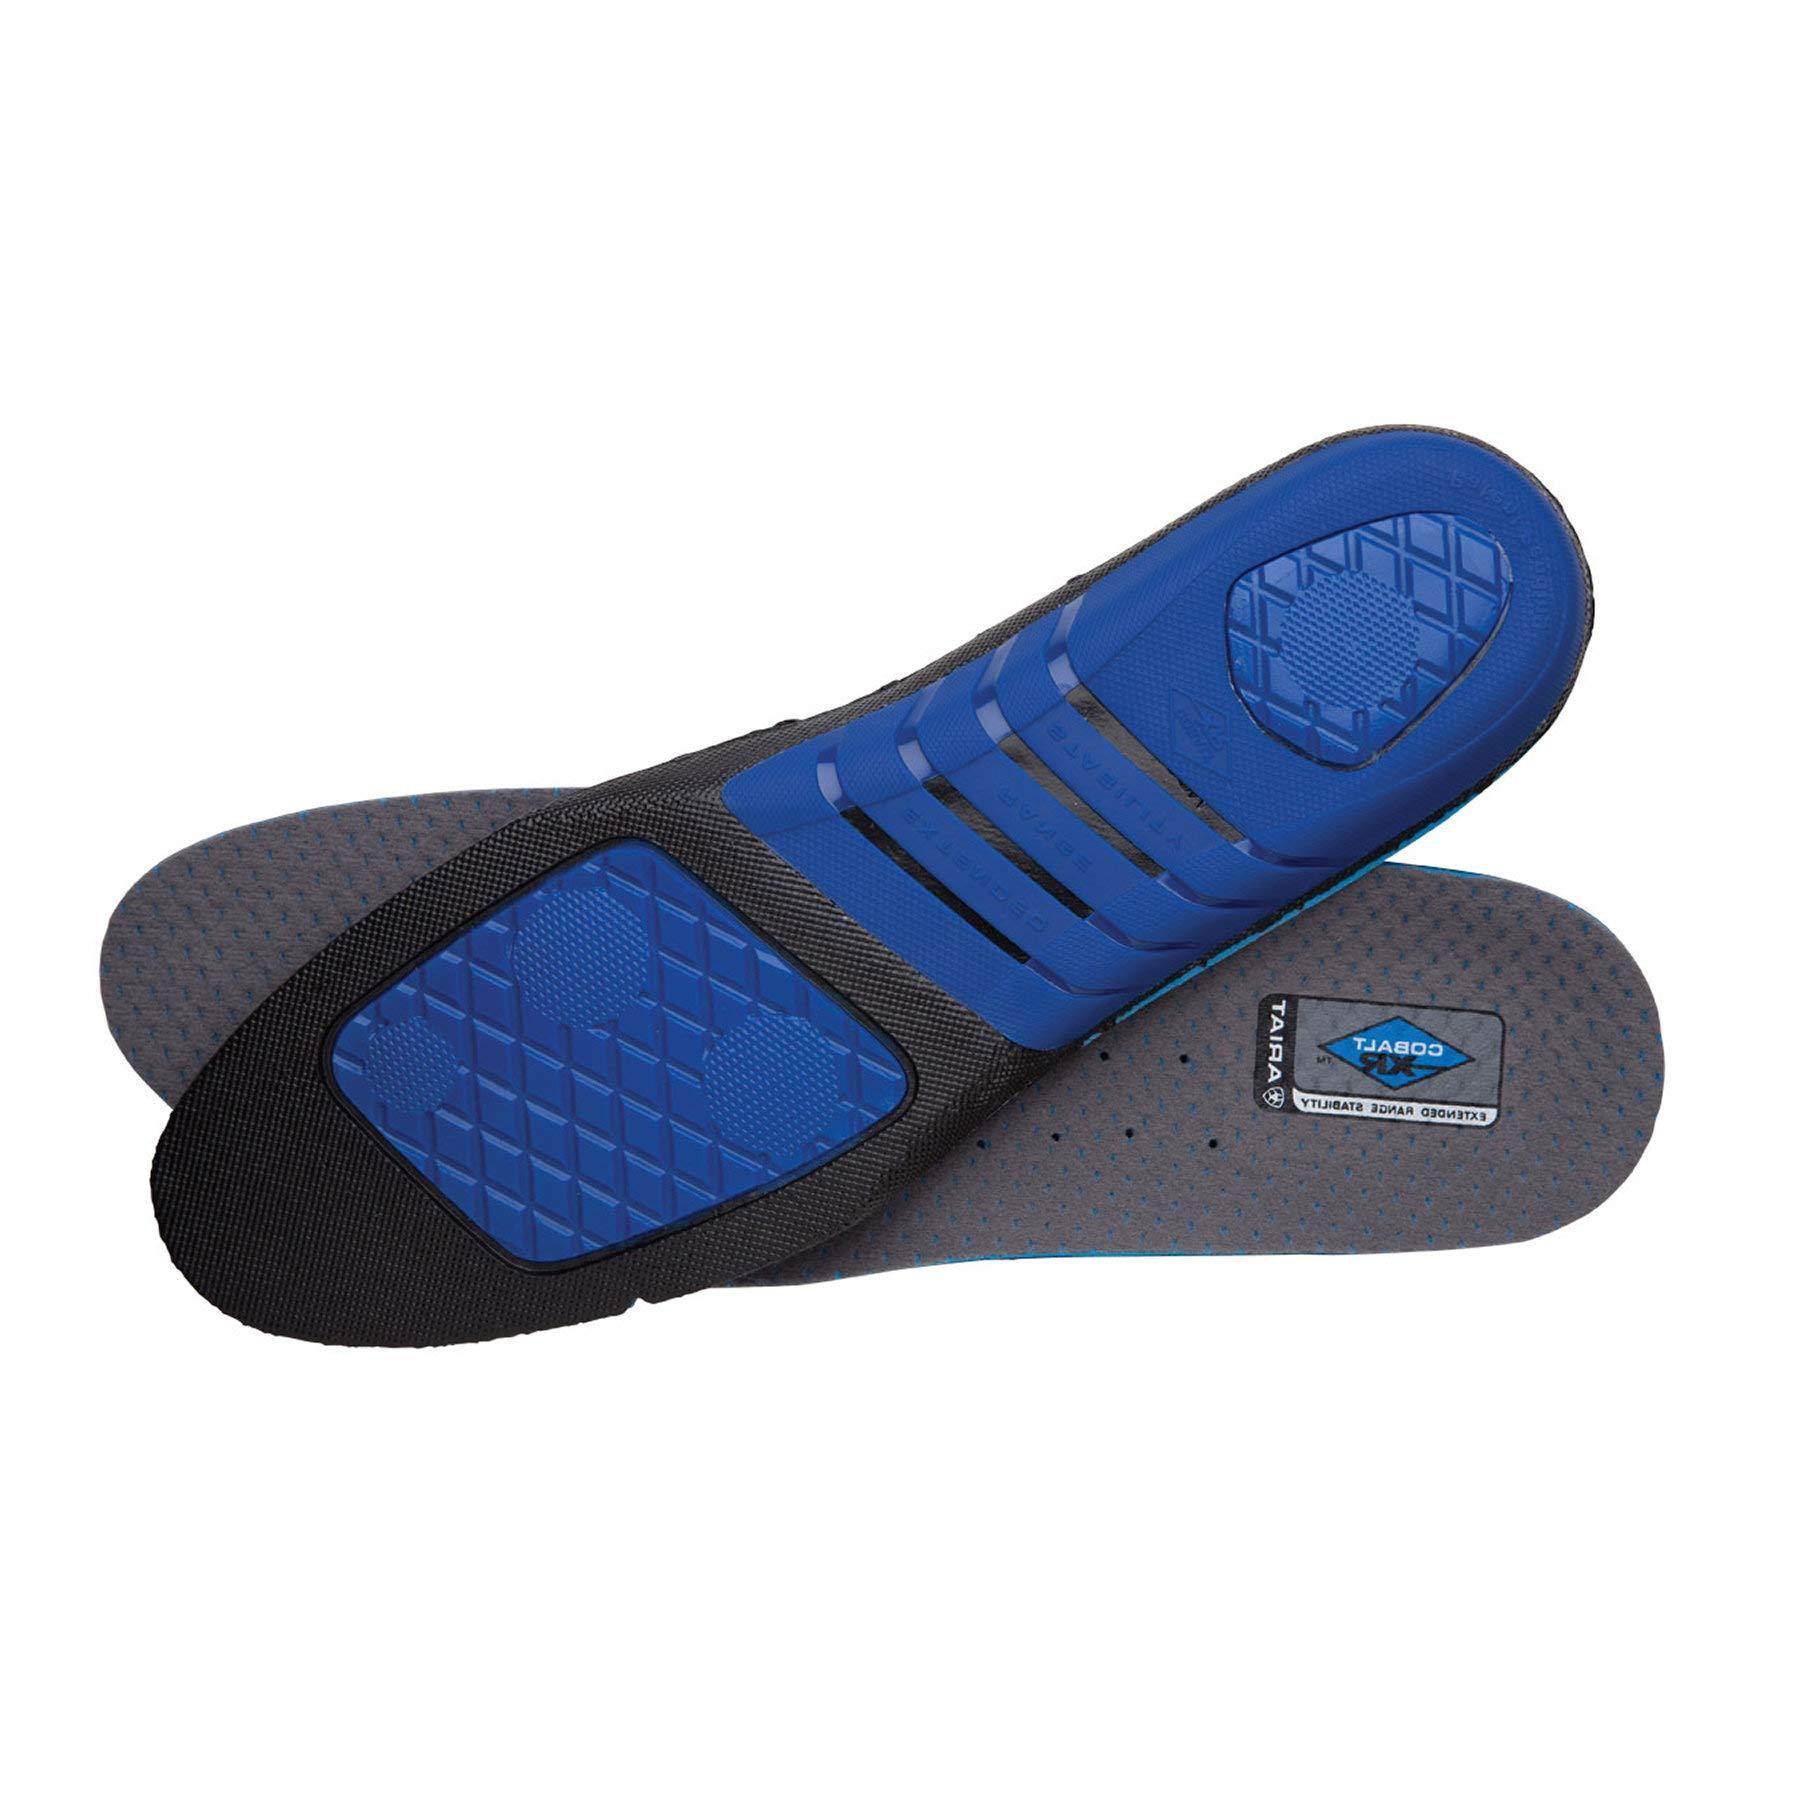 Ariat Unisex Cobalt Replacement Footbeds